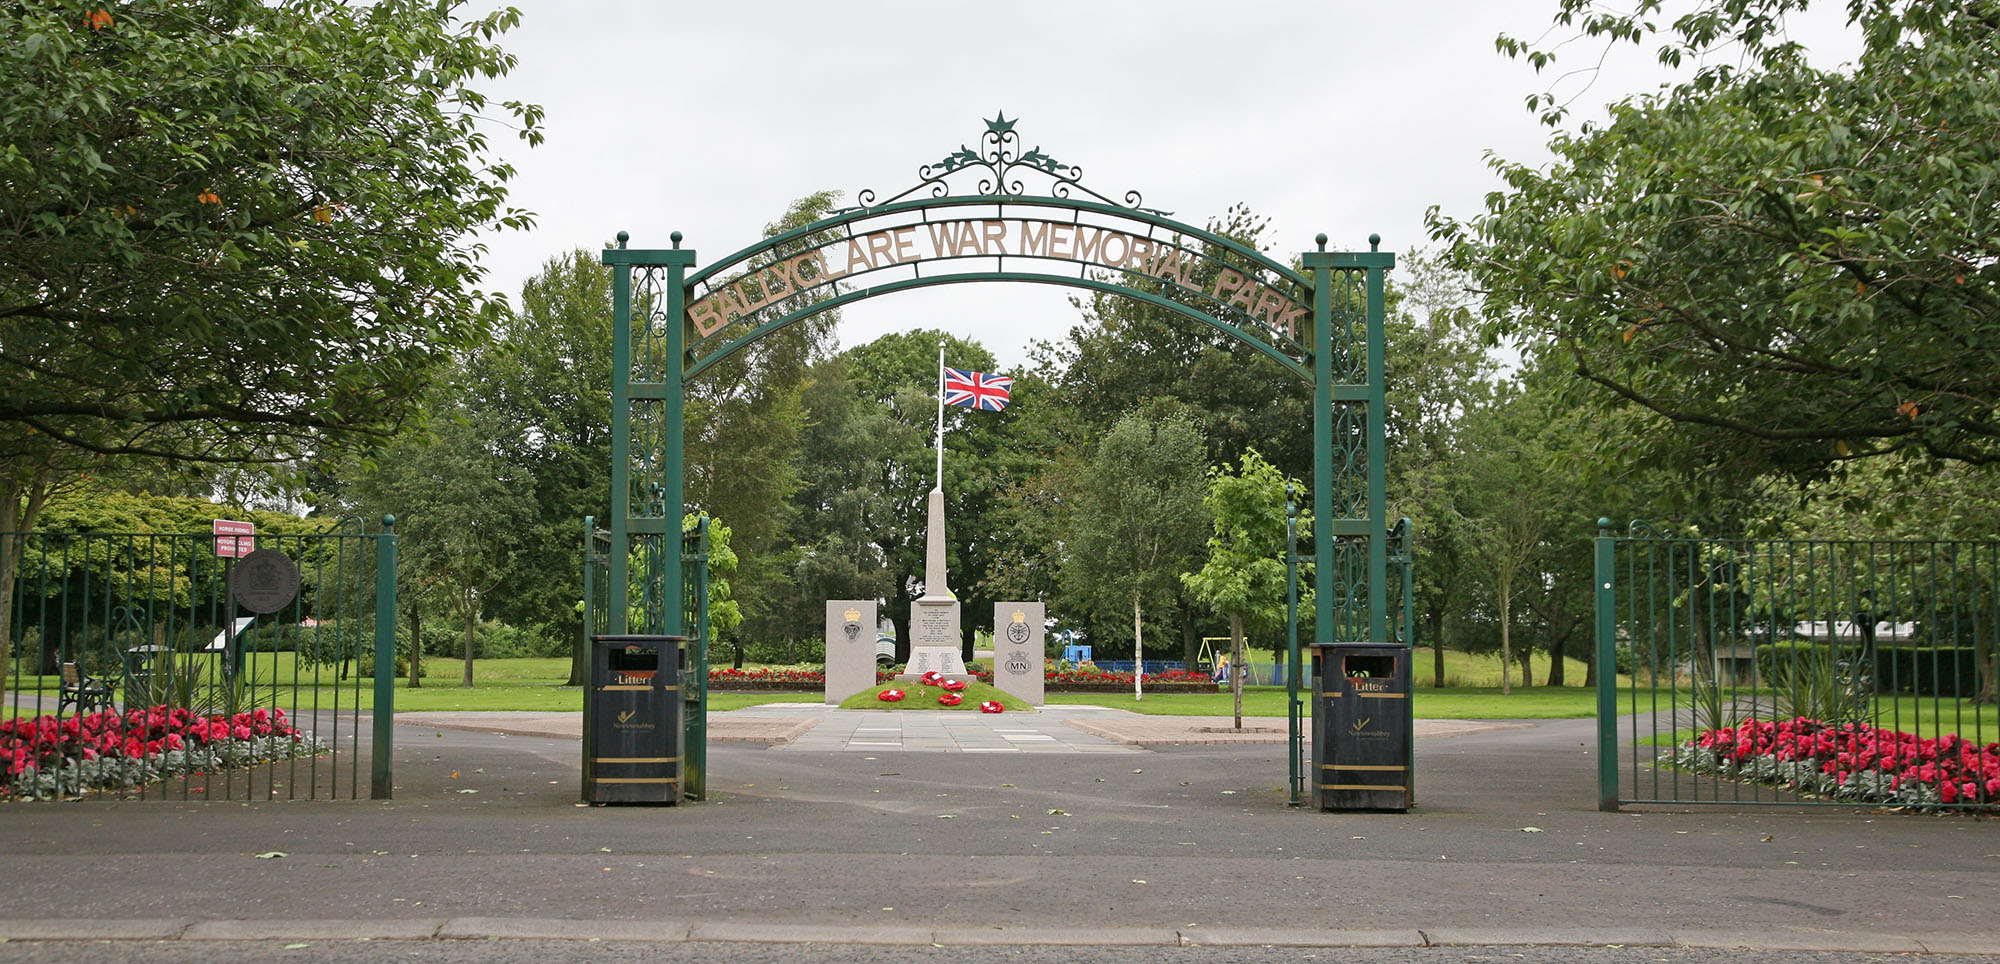 Ballyclare War Memorial Park